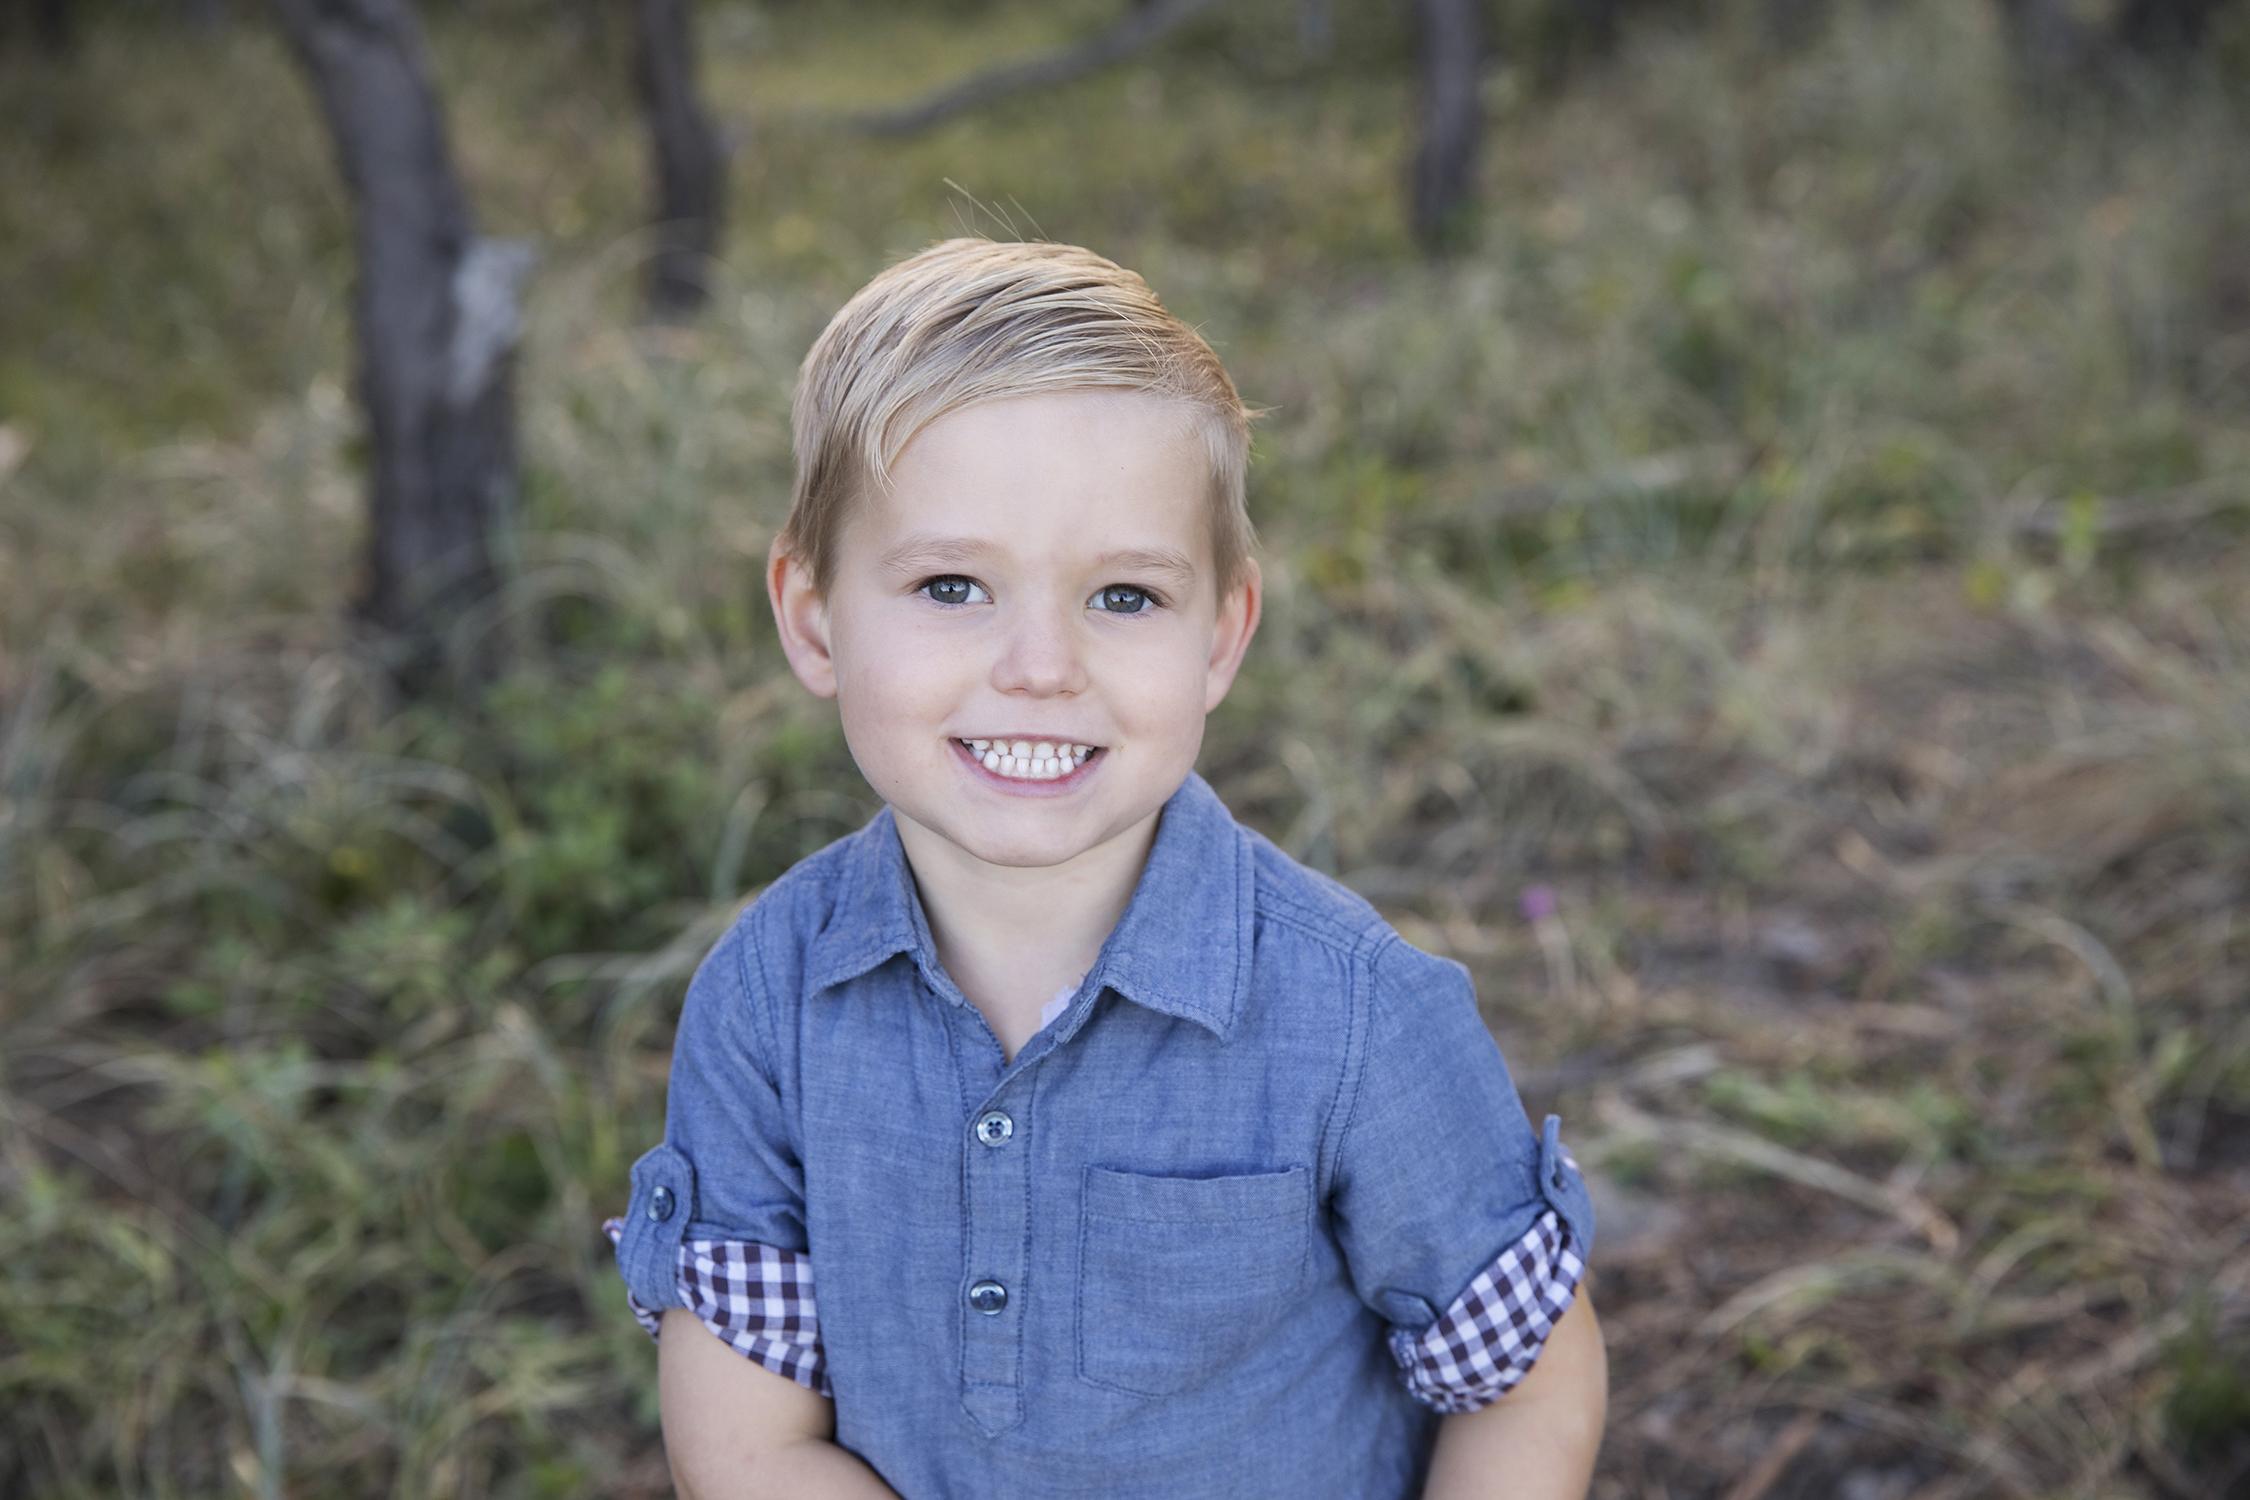 ChildPortrait_PrichardSiblingKingscliff_EnigmaVisionsPhotography (9).jpg